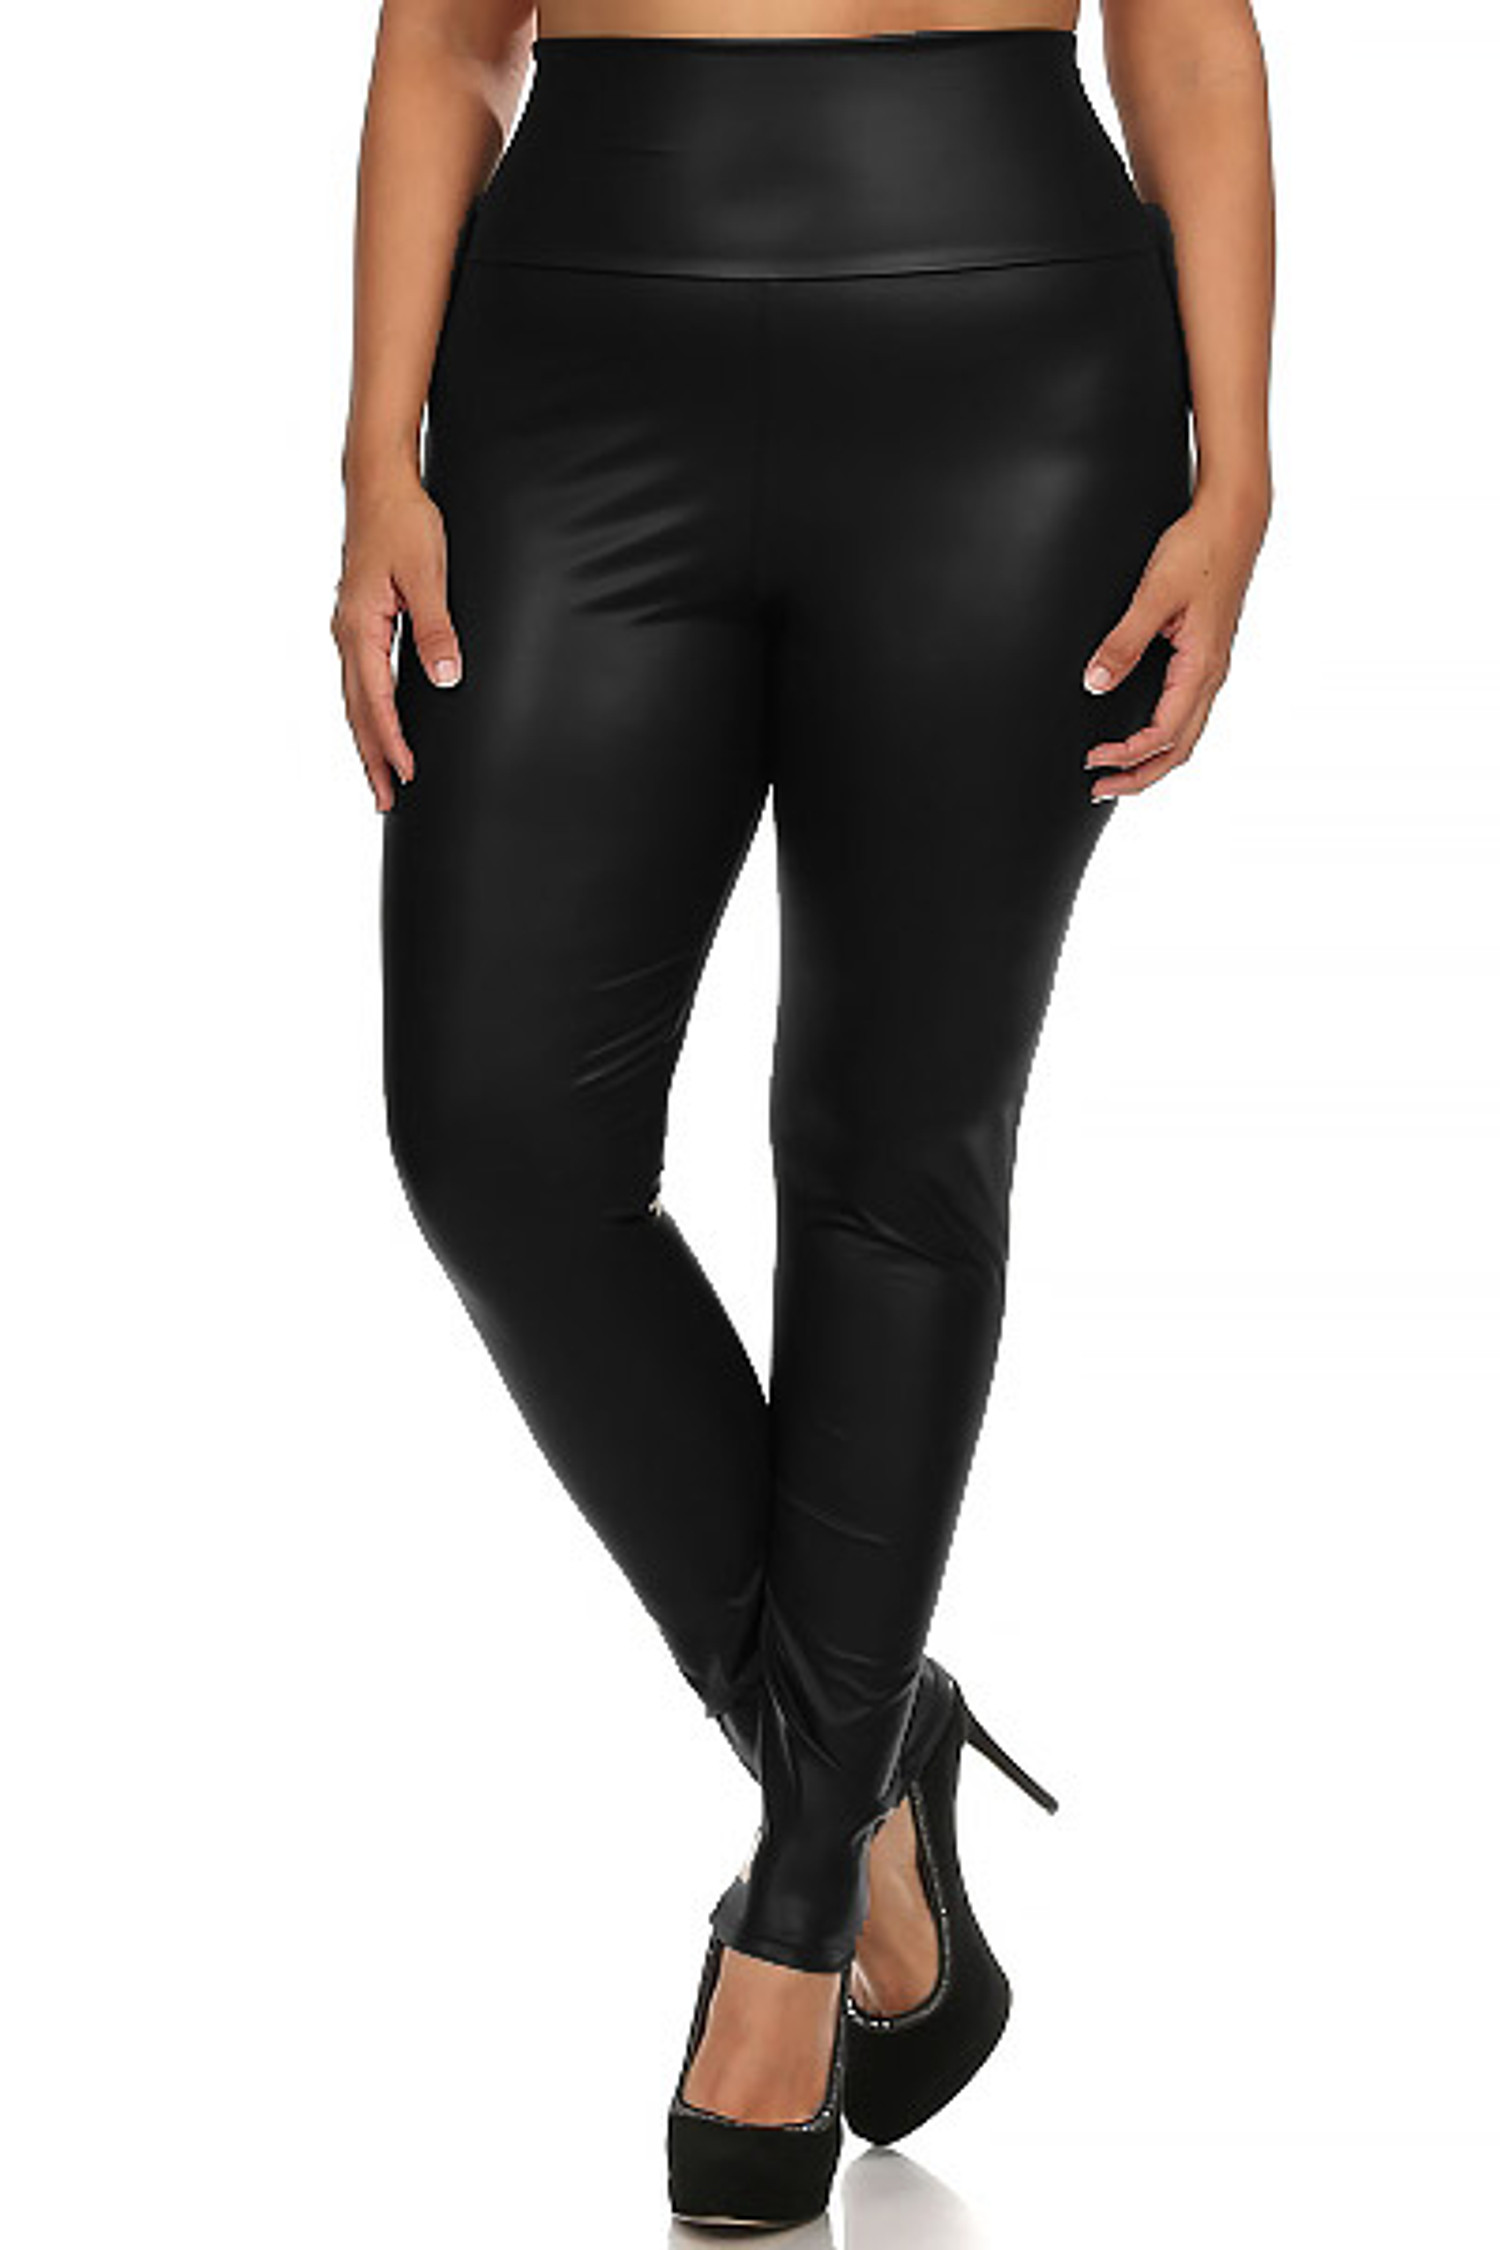 Black Matte High Waisted Black Faux Leather Plus Size Leggings